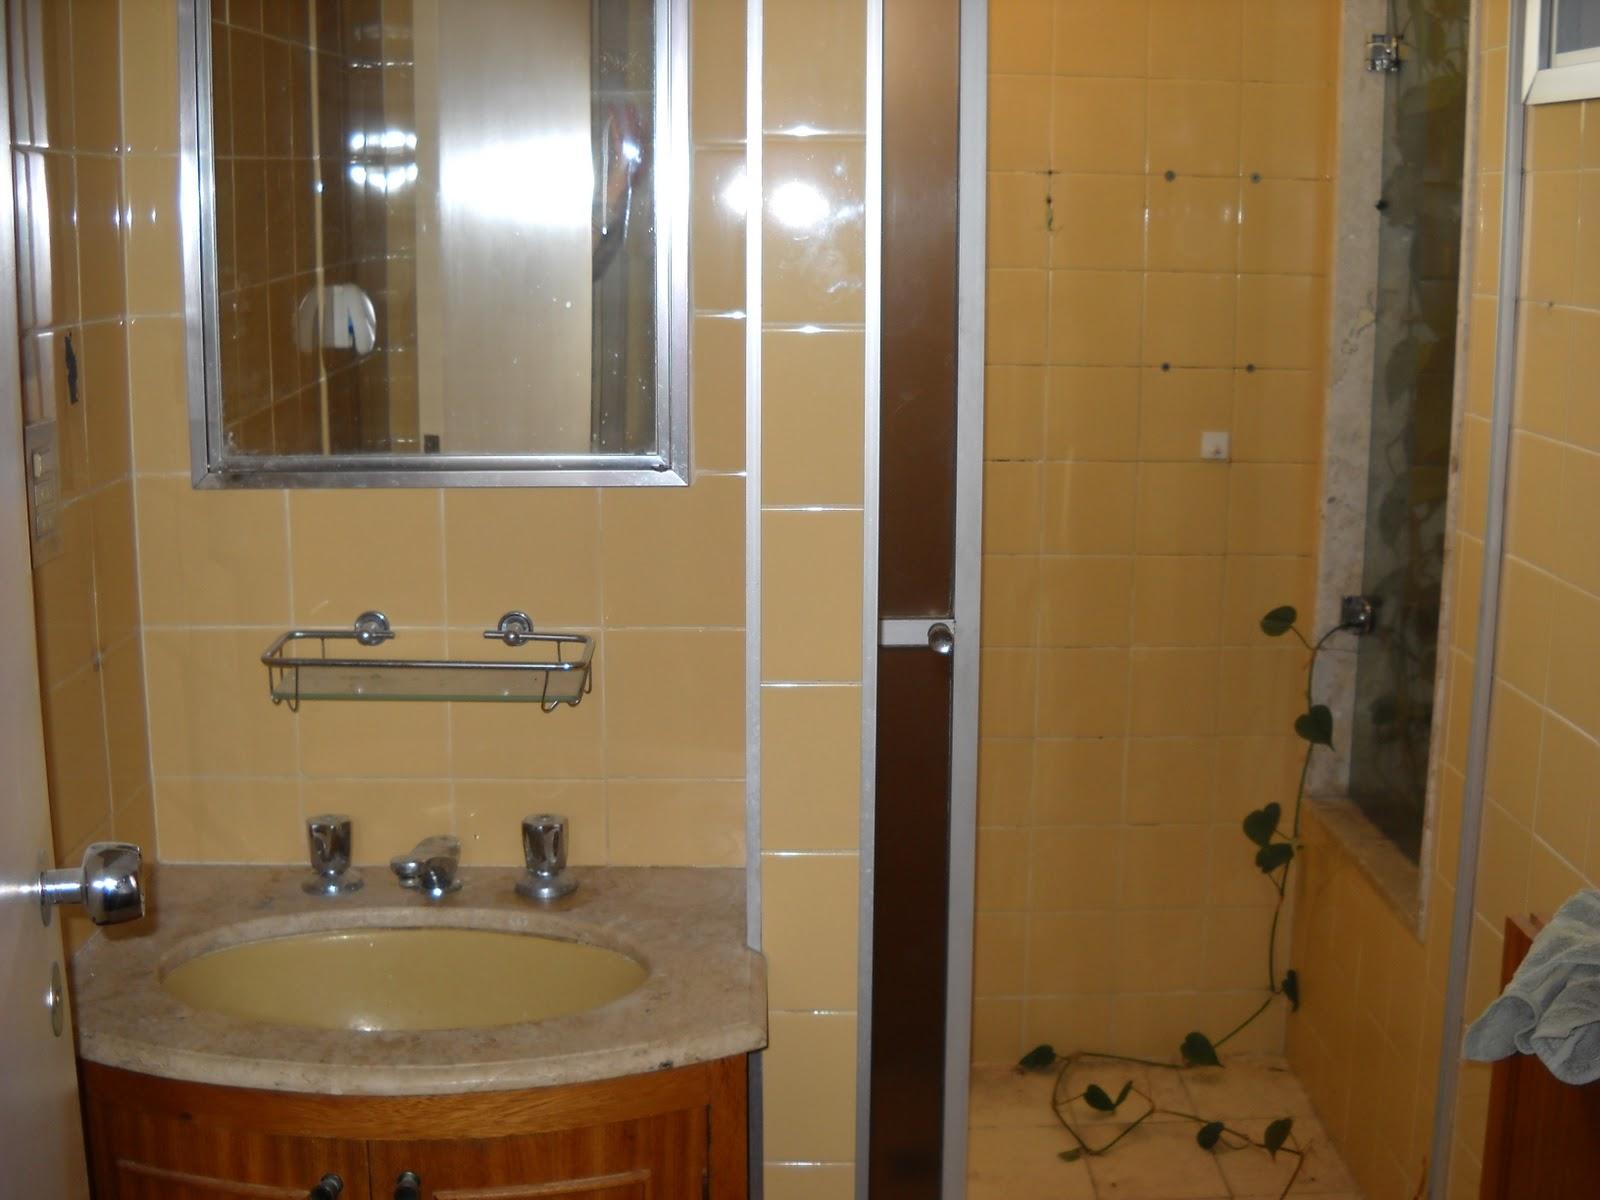 Imagens de #68441F segunda feira 4 de outubro de 2010 1600x1200 px 3250 Box Acrilico Para Banheiro Feira De Santana